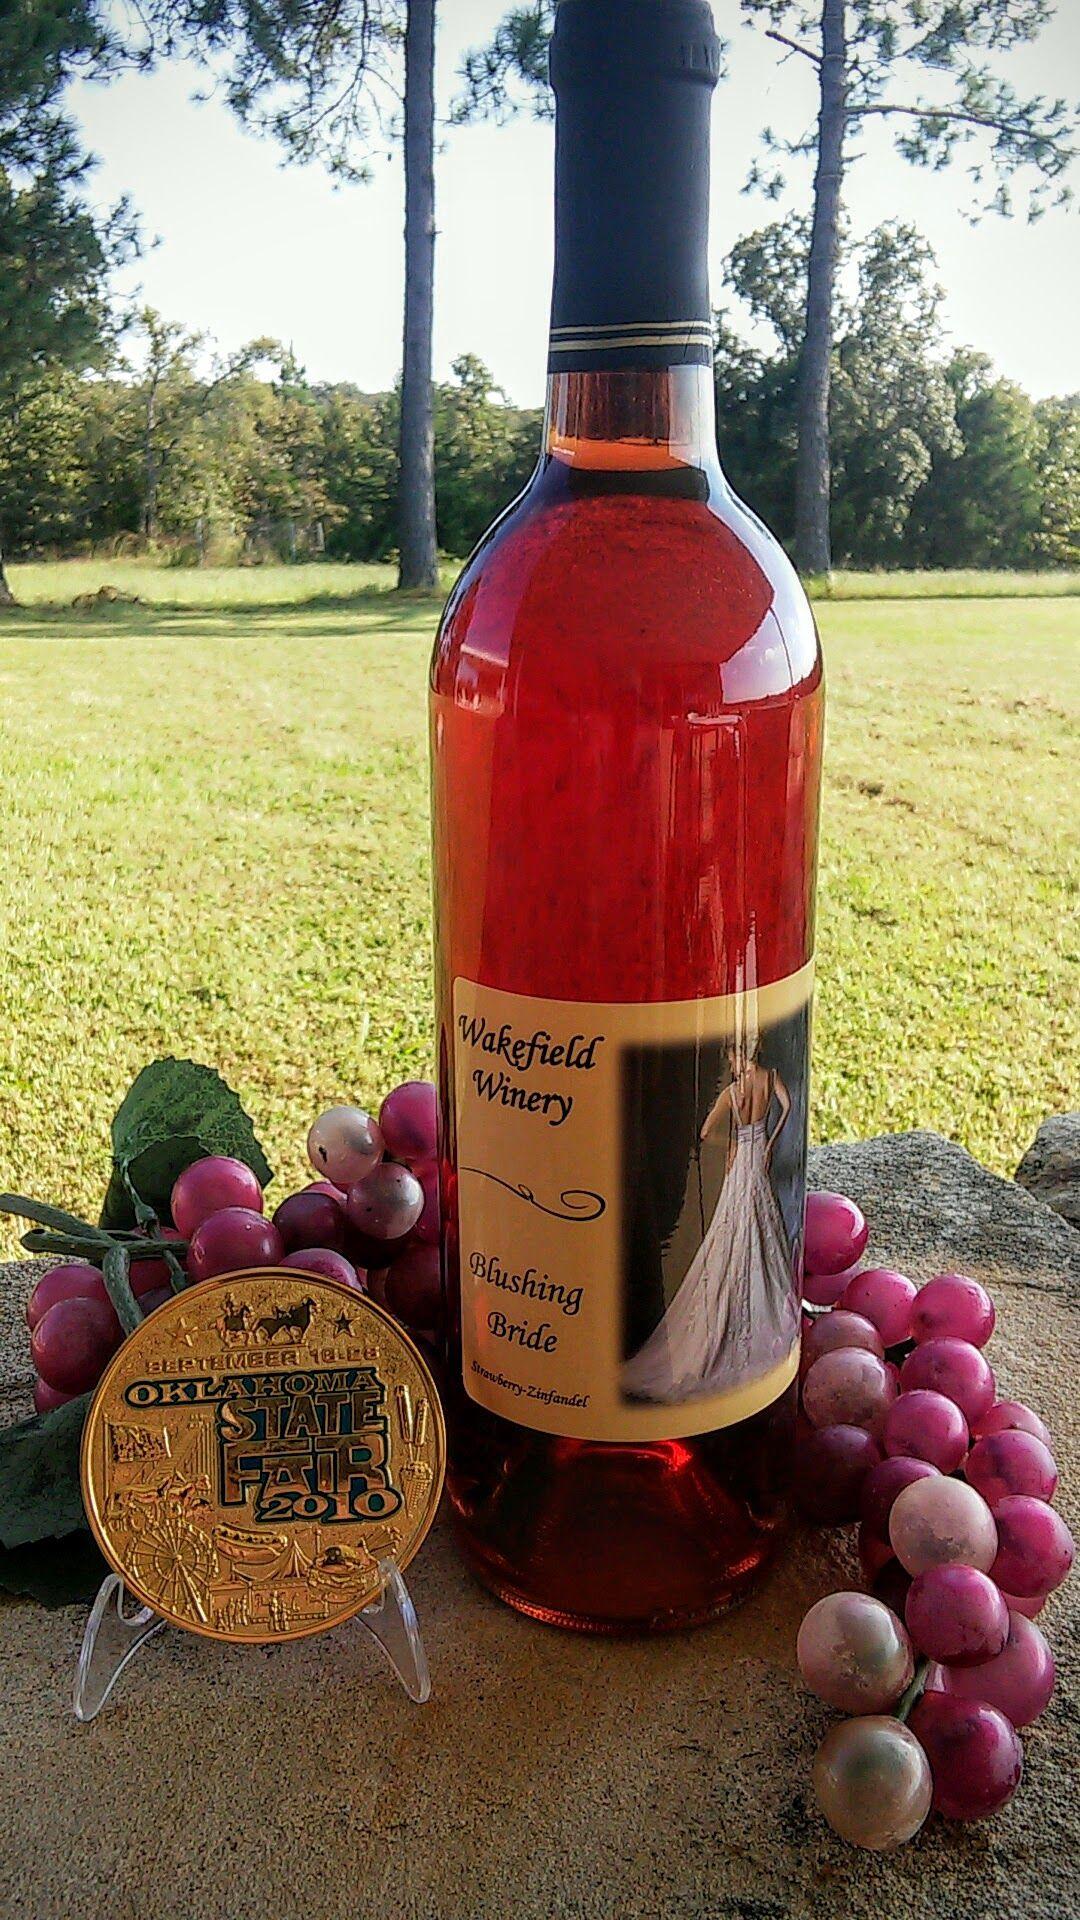 Winery Gerty Oklahoma Wine Bottle Rose Wine Bottle Wines